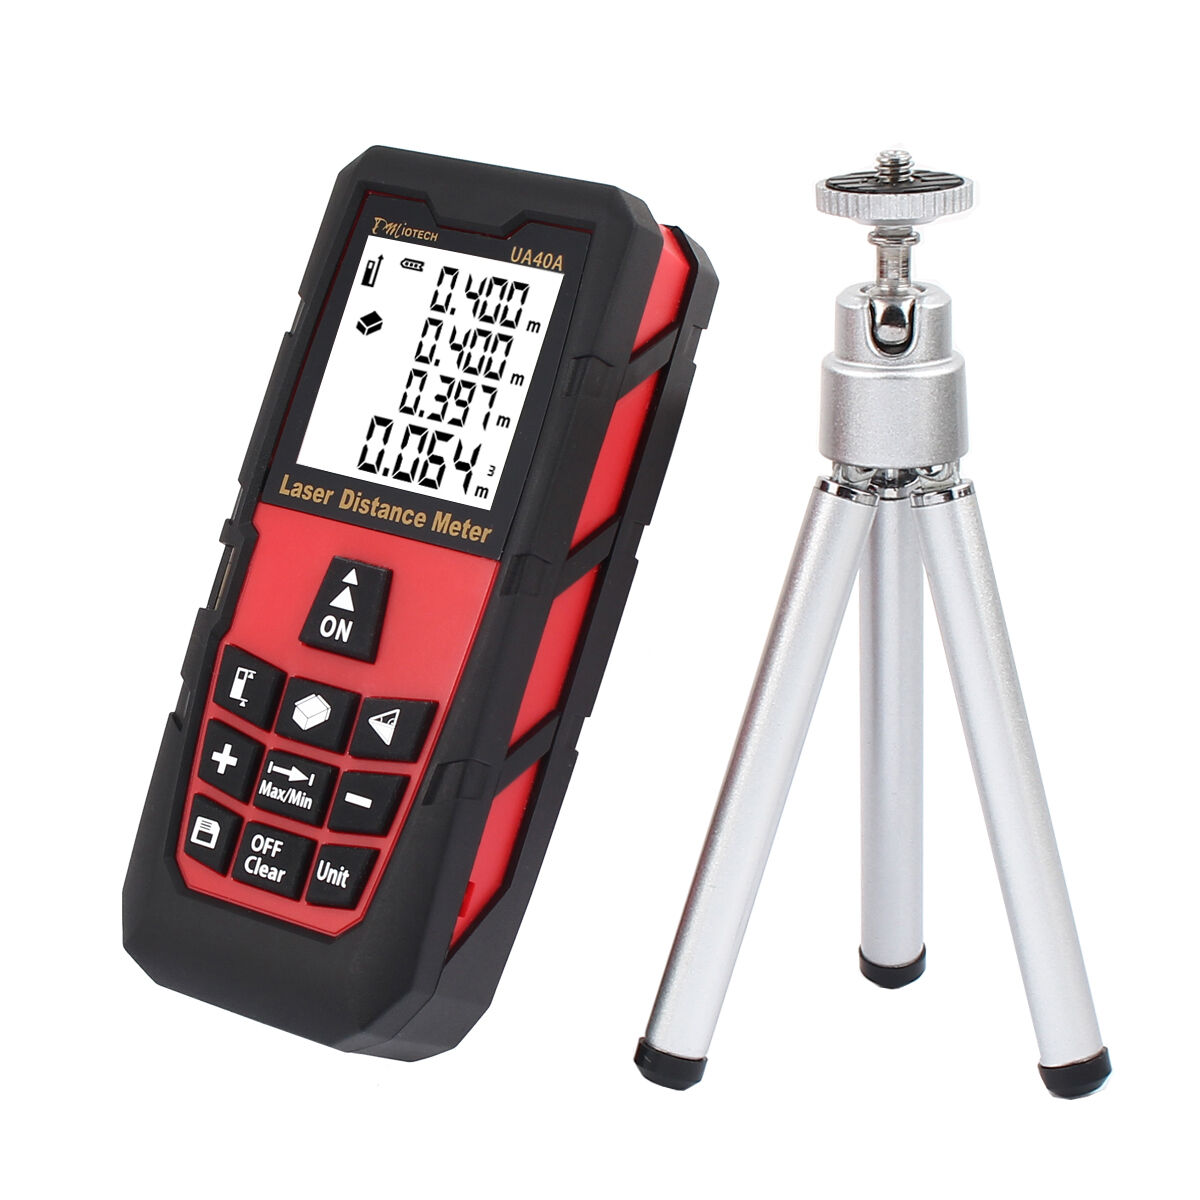 Digital LCD Laser Distance Meter Range Finder Measure Tape Tool With Tripod